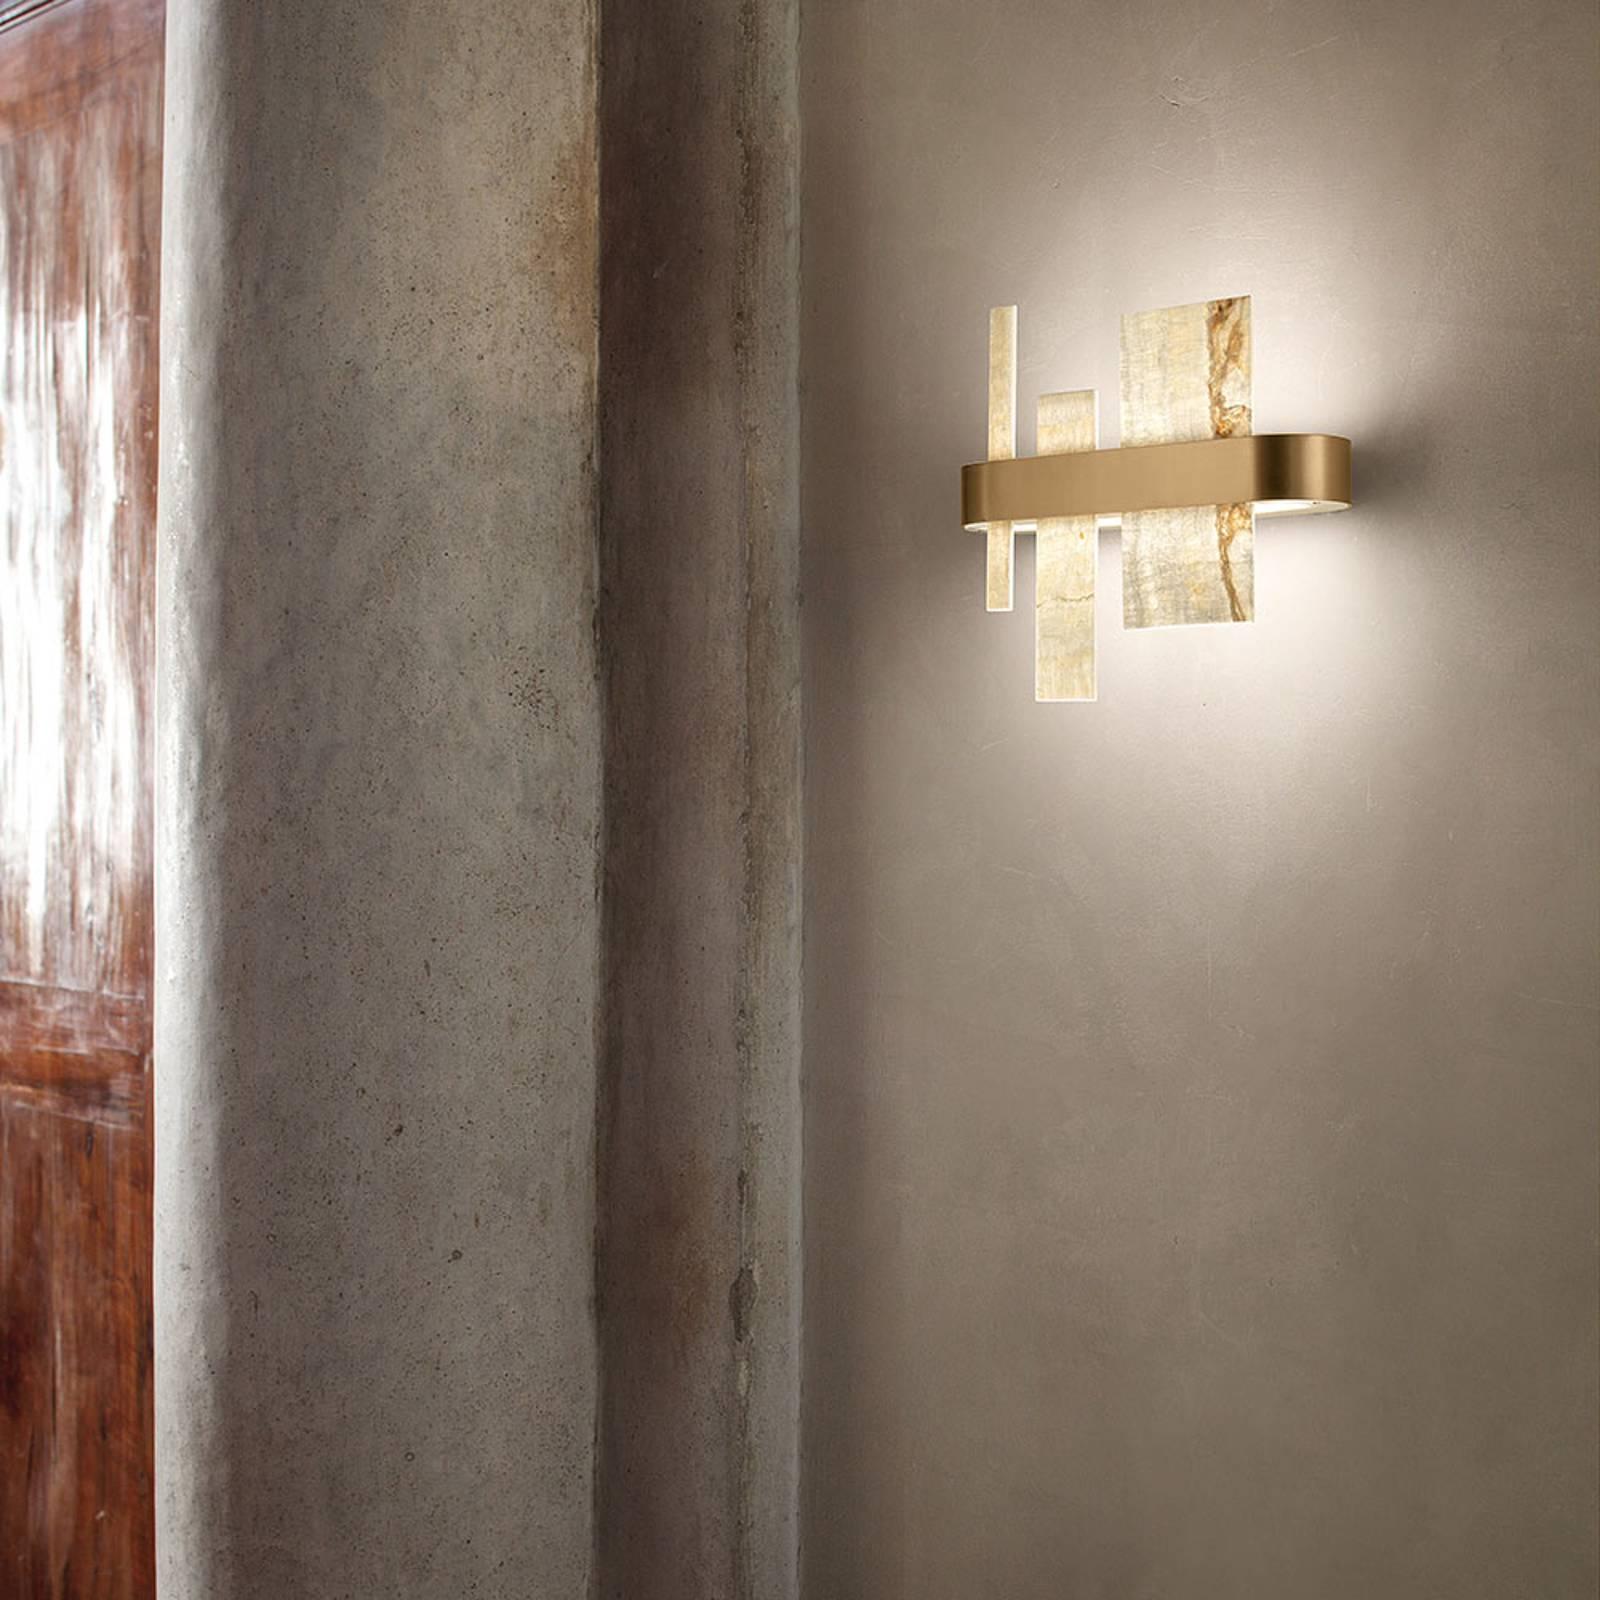 Design-seinävalaisin Honicé LED-valoilla, 37 cm